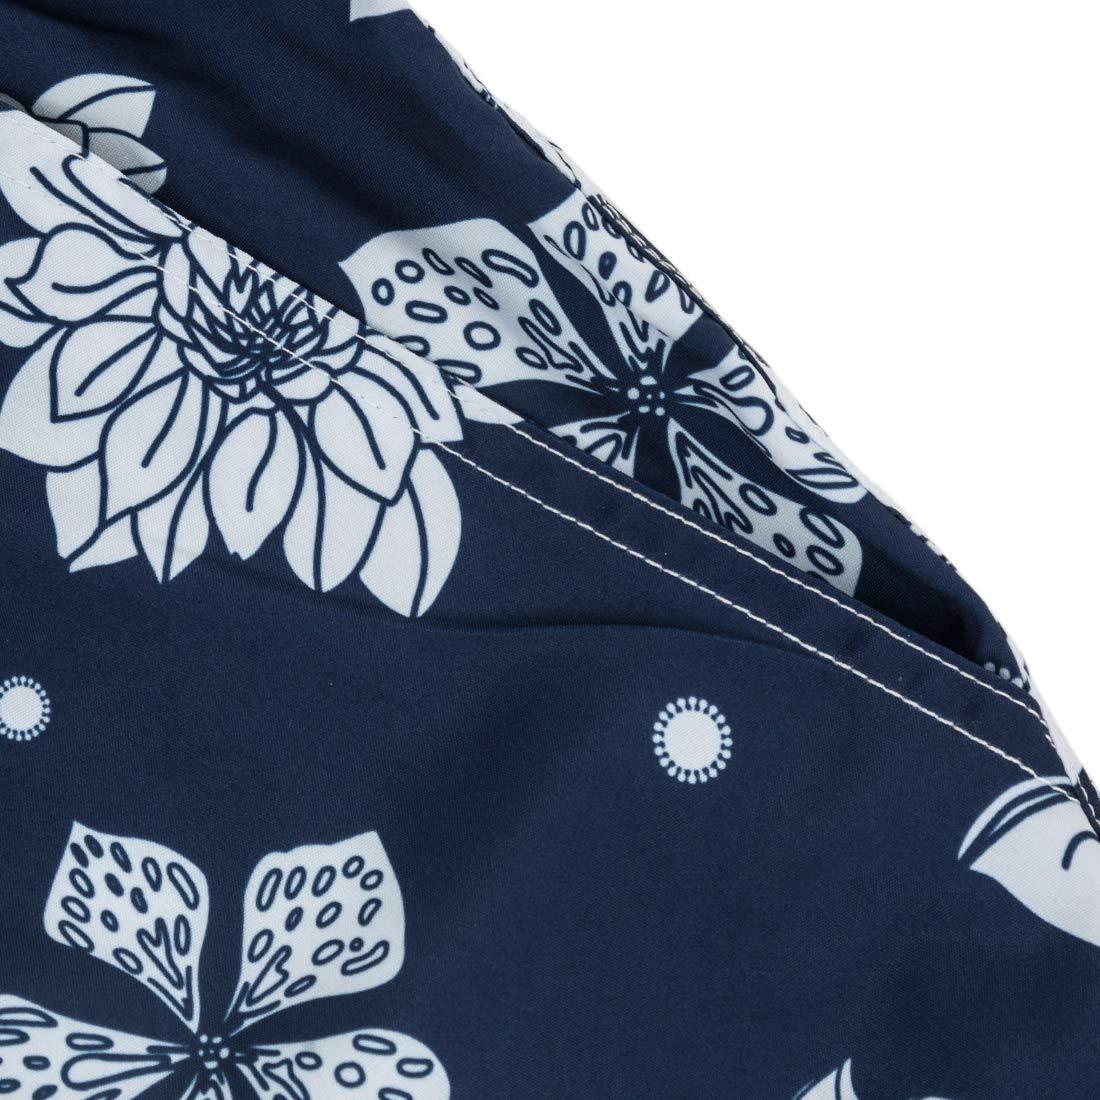 ELETOP Mens Swim Trunks Quick Dry Board Shorts Beach Holiday Bathing Suit Print Swimwear L1